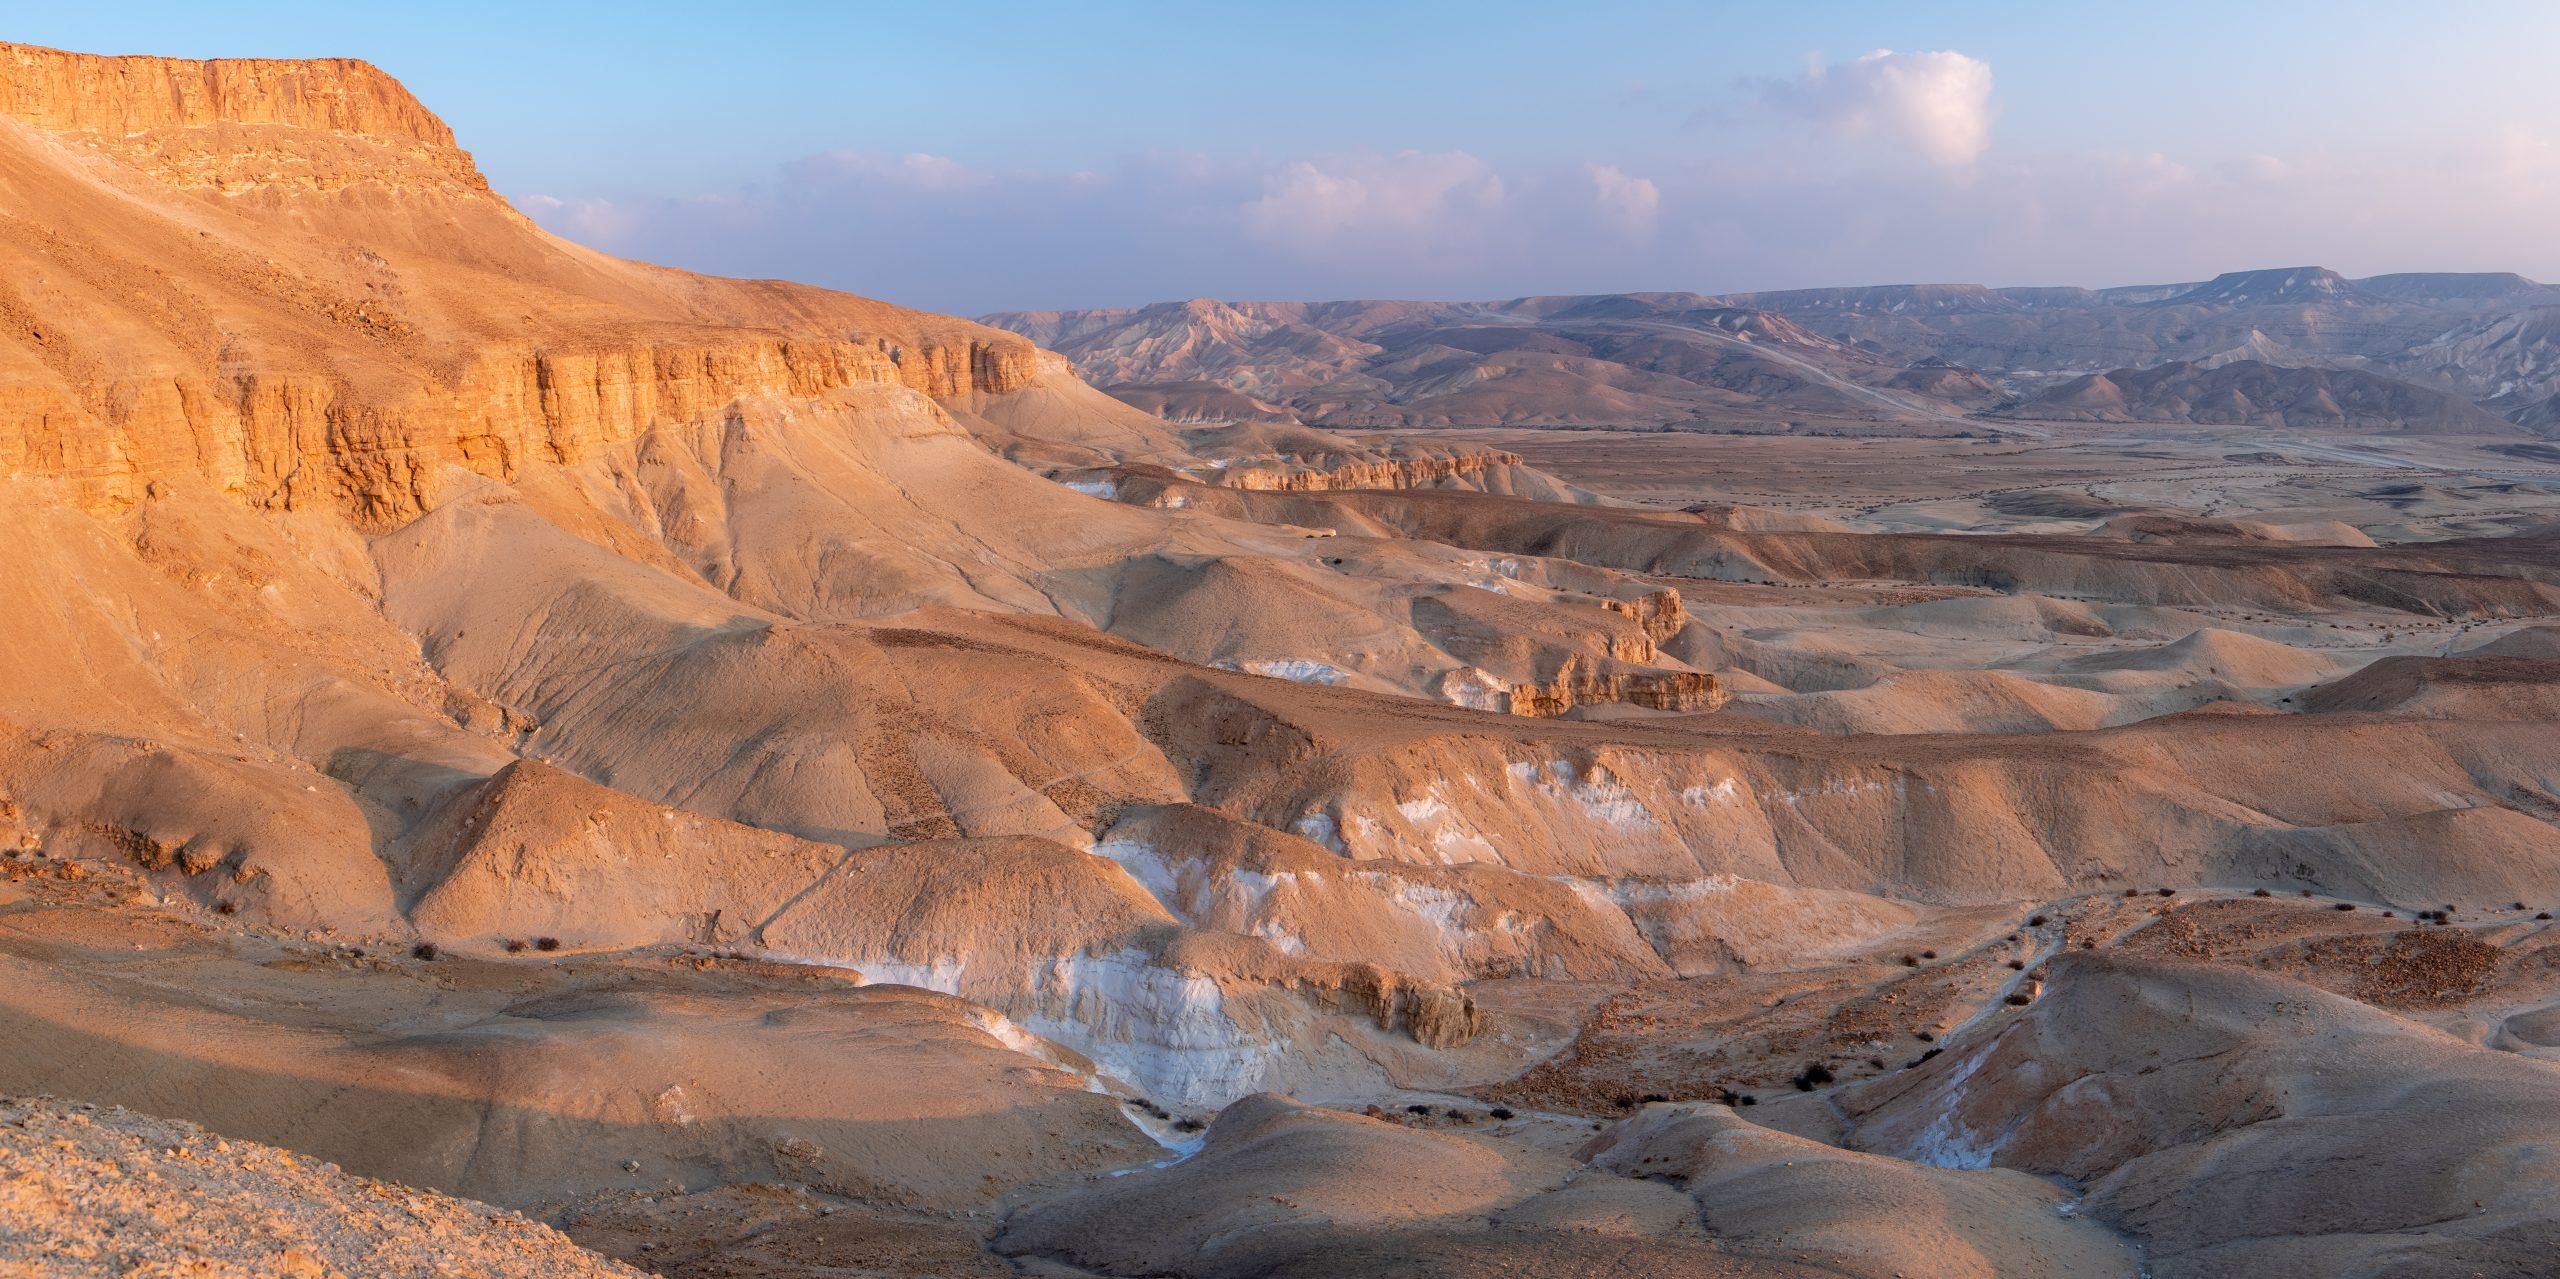 Atv Desert Buggies In The Negev2